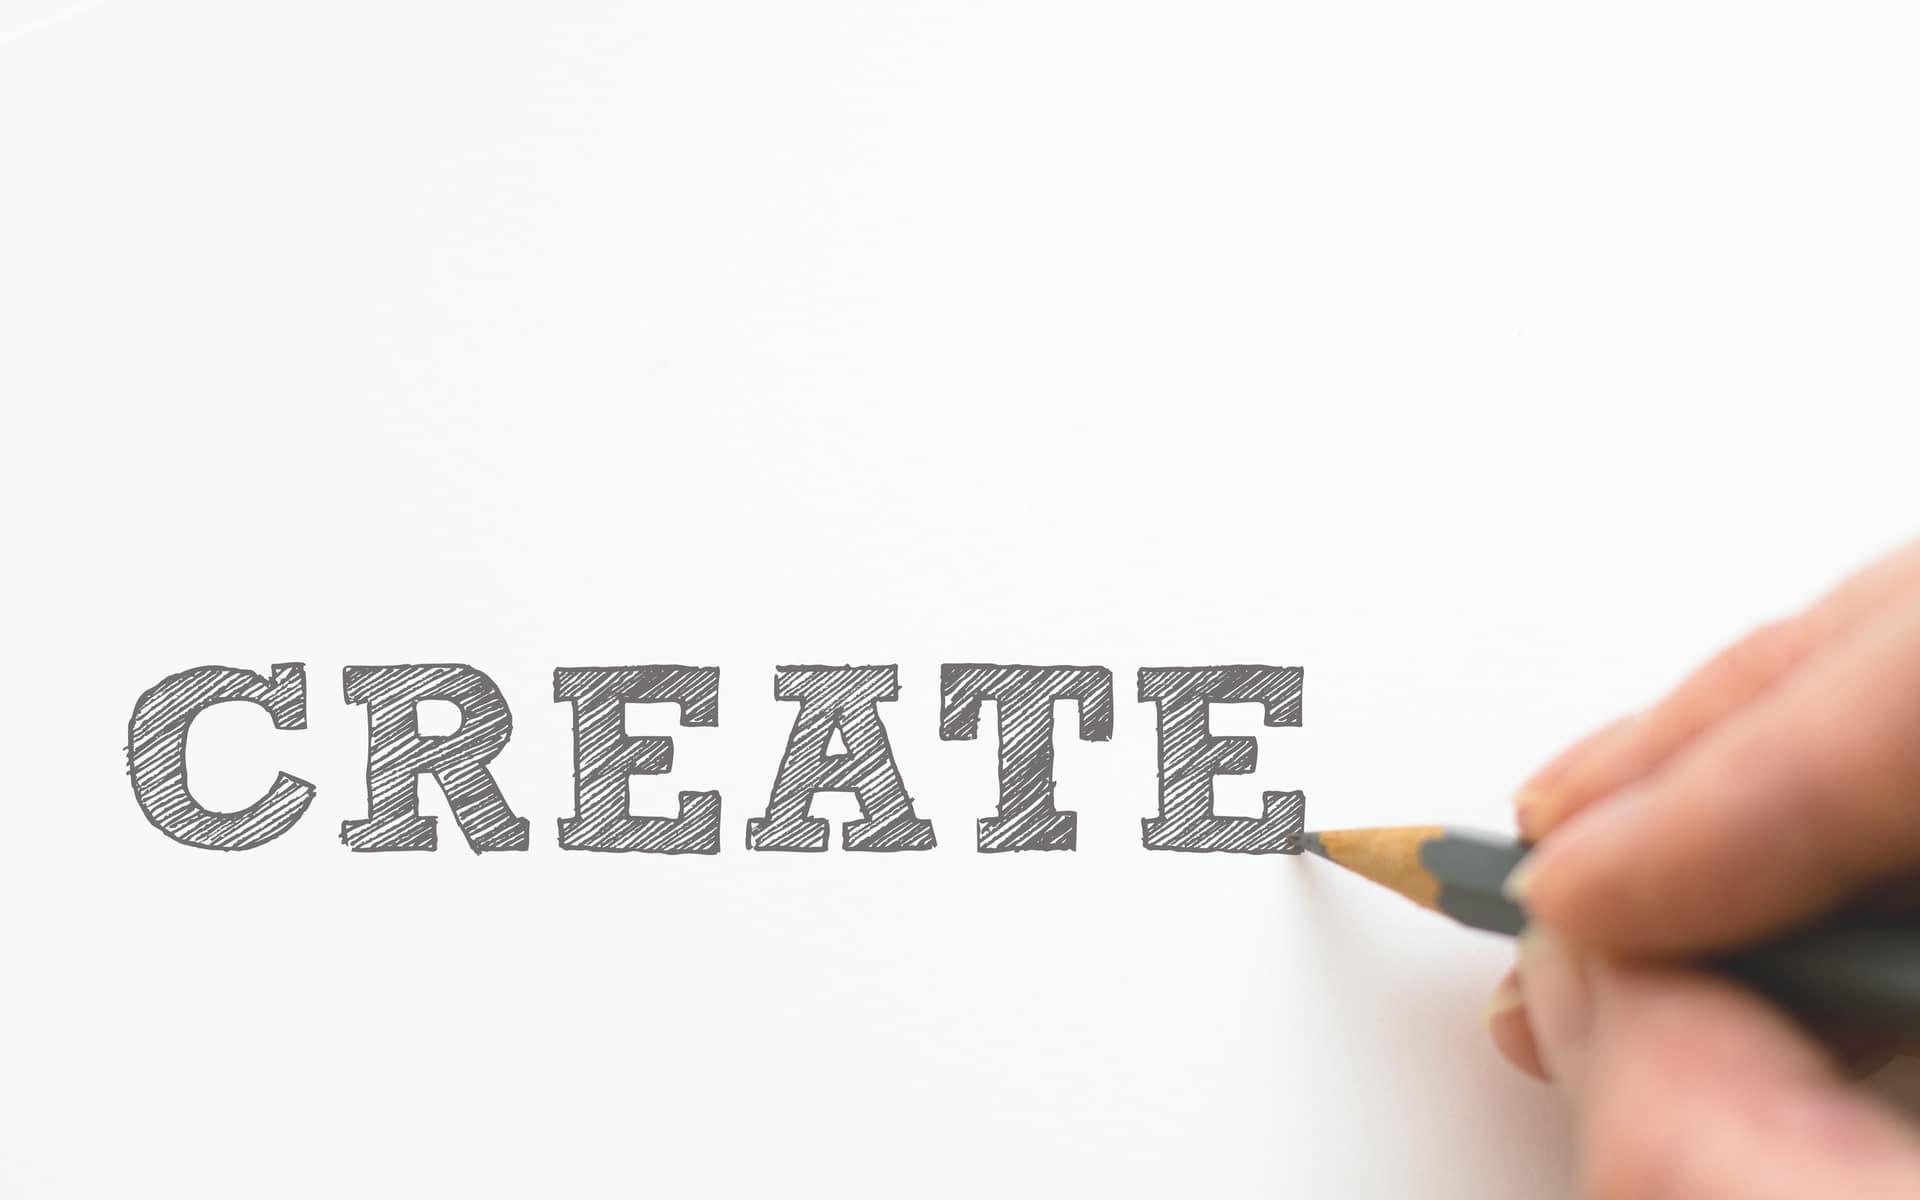 Web Design, Creating New Website